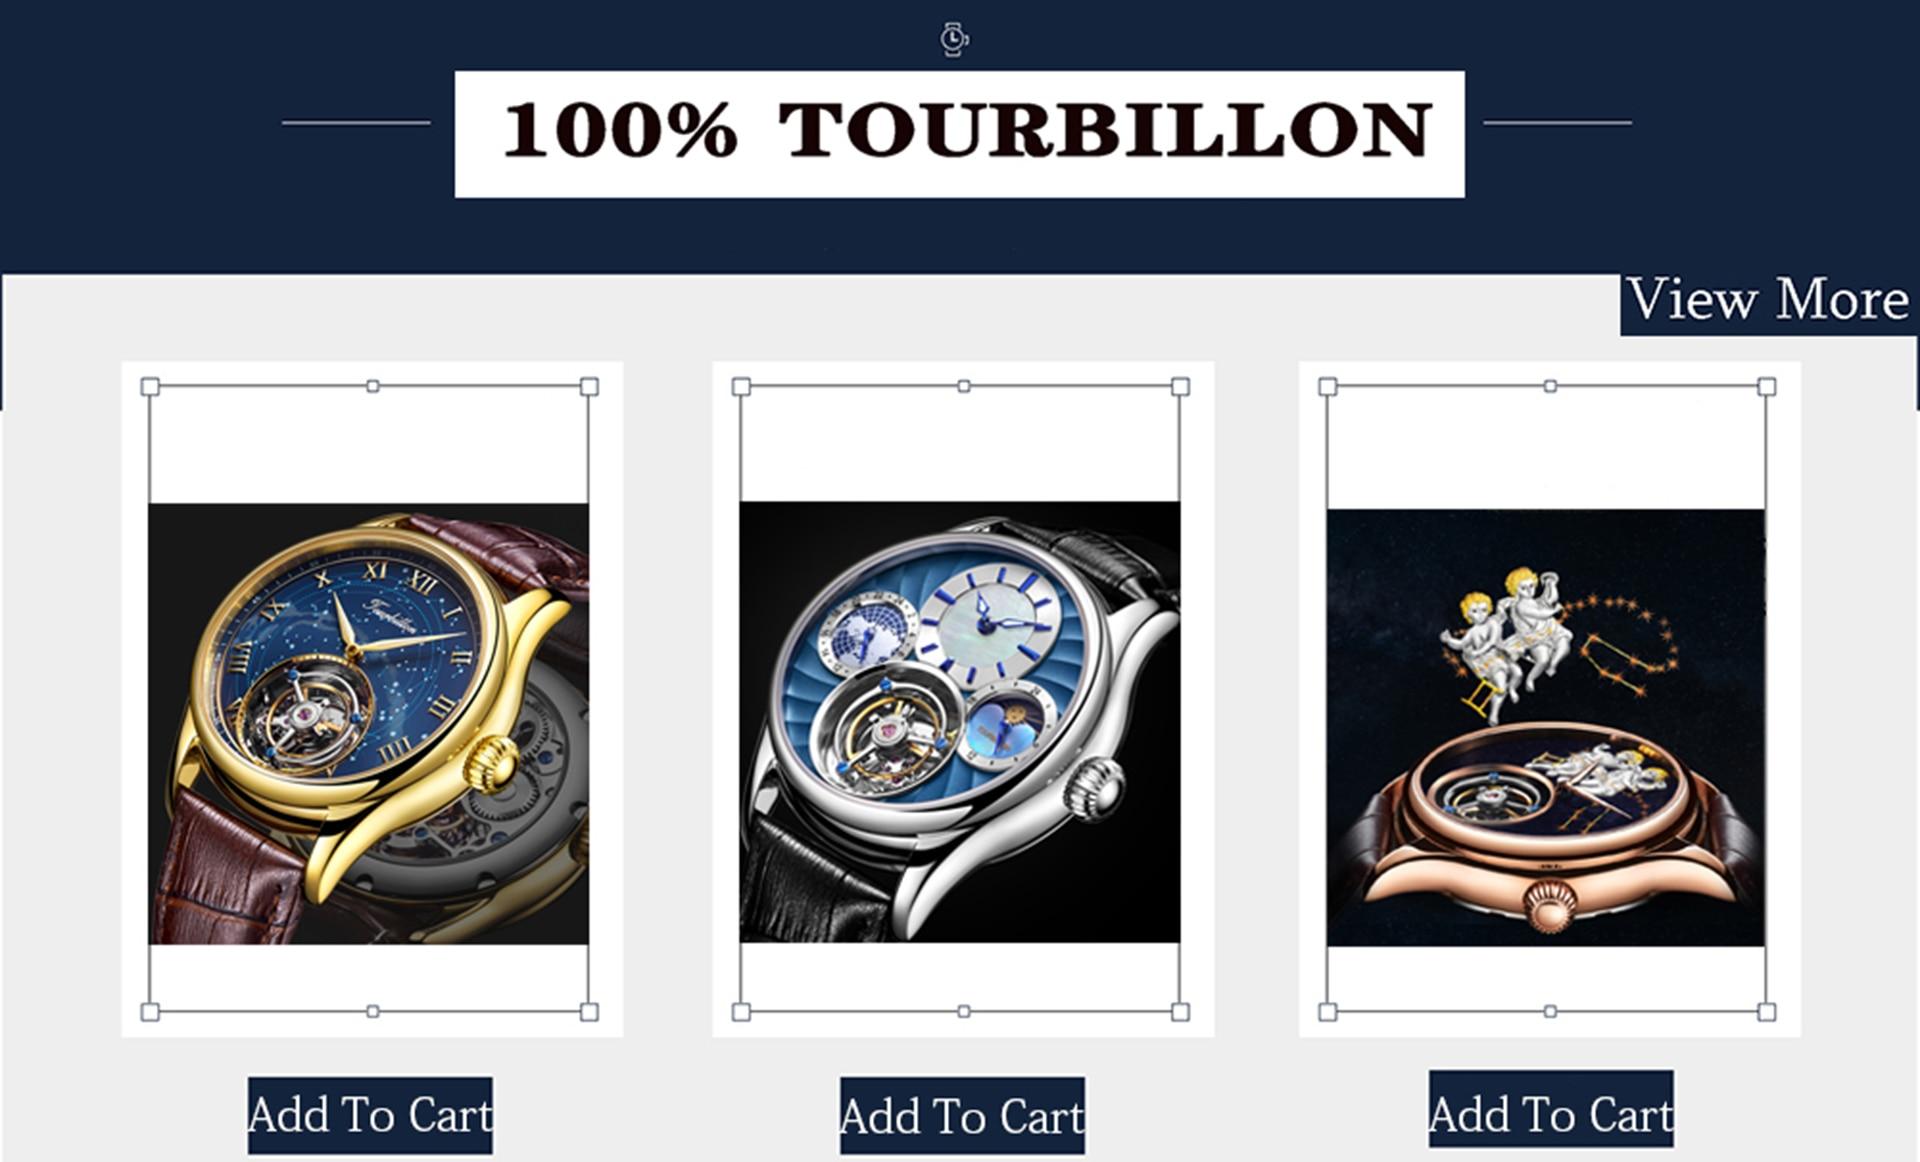 H0dbd892436ec4595b32f74bfc2df2433j GUANQIN 2019 business watch men Automatic Luminous clock men Tourbillon waterproof Mechanical watch top brand relogio masculino